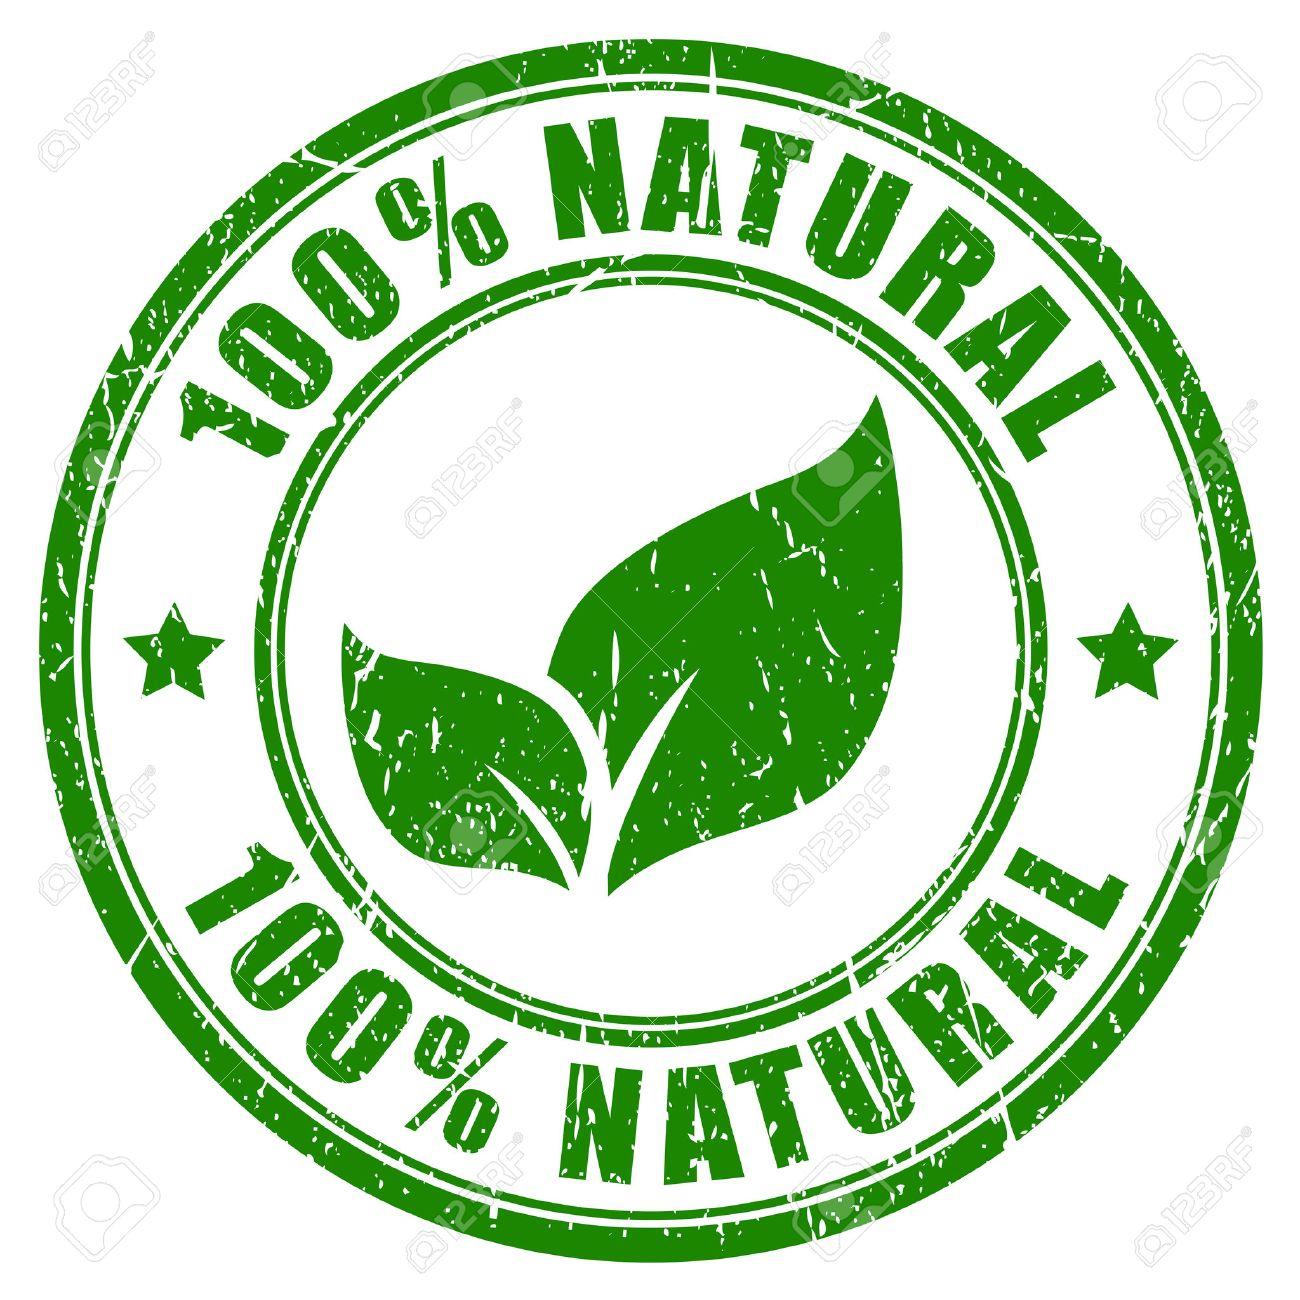 100 natural stamp - 35086830